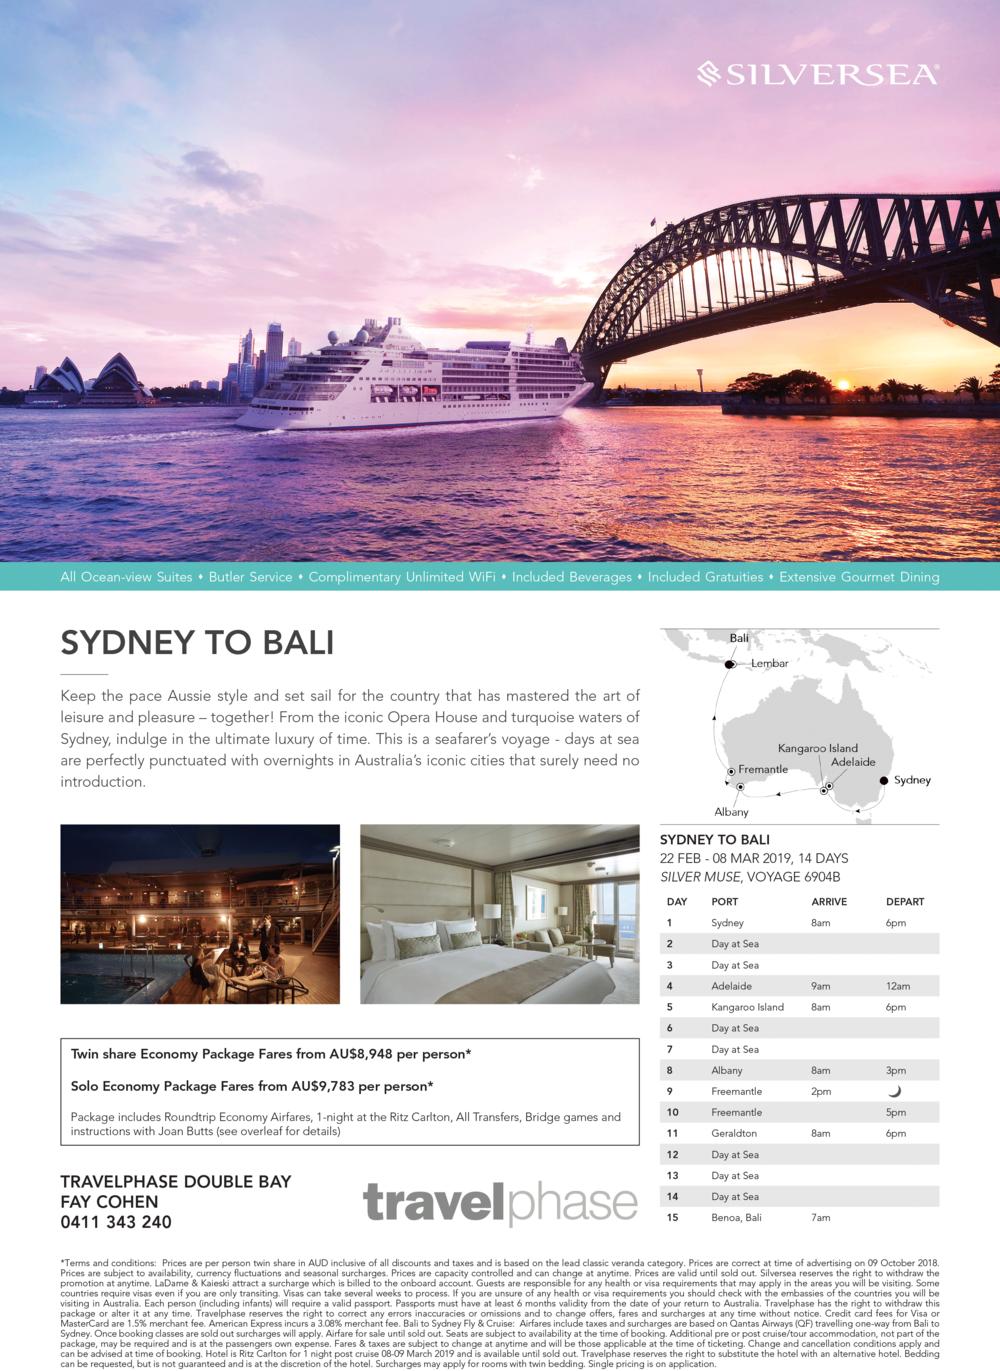 Silversea Muse Australian Cruise Details